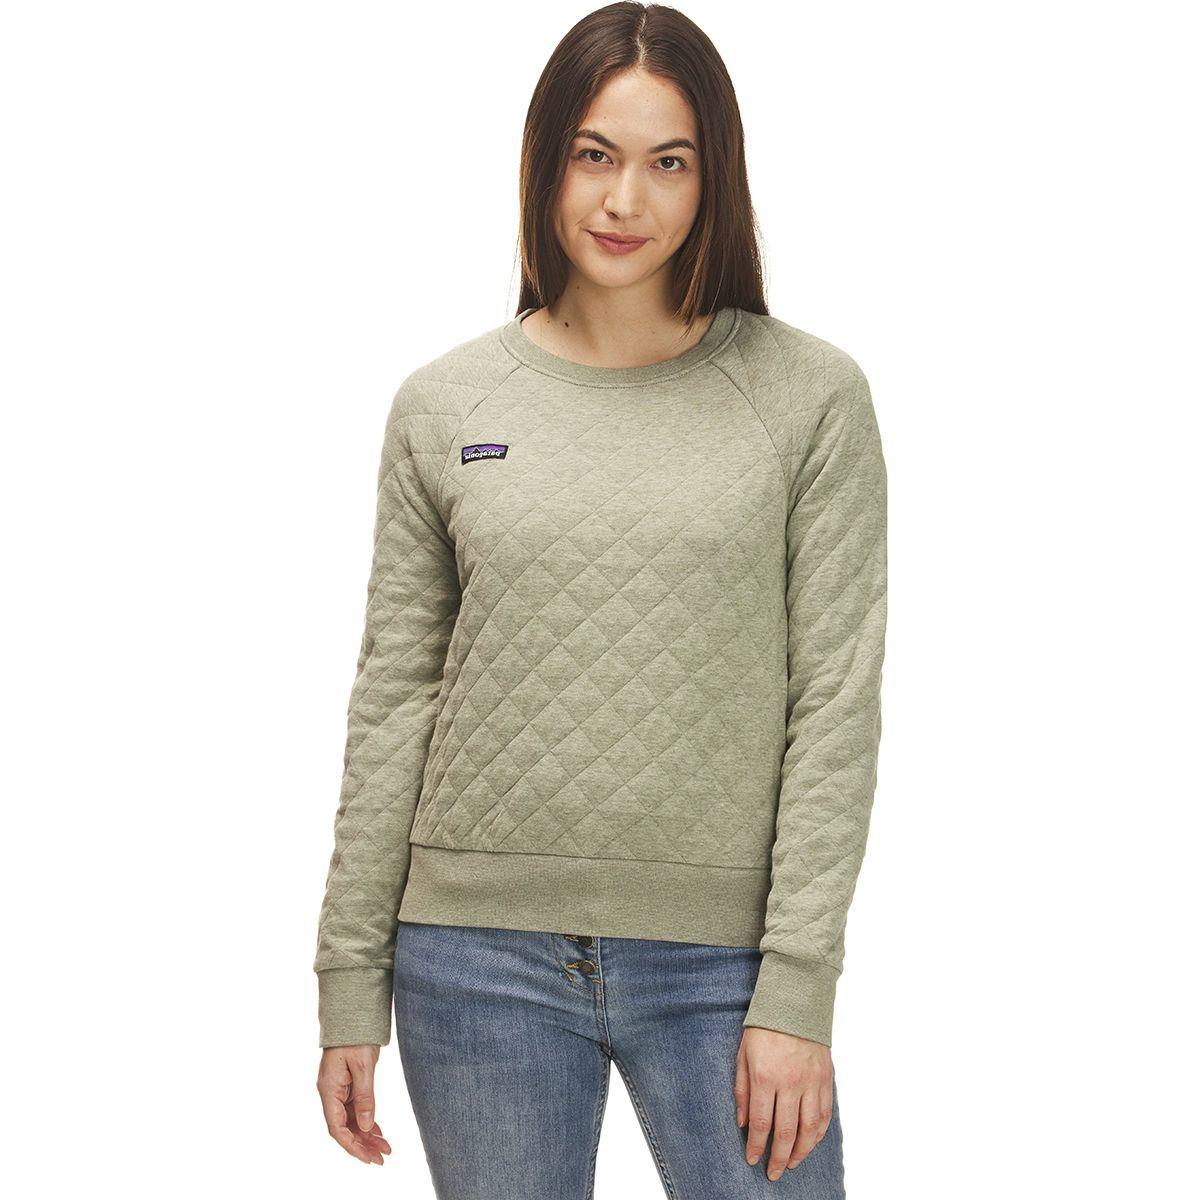 Patagonia Organic Cotton Quilt Crew Sweatshirt - Women's